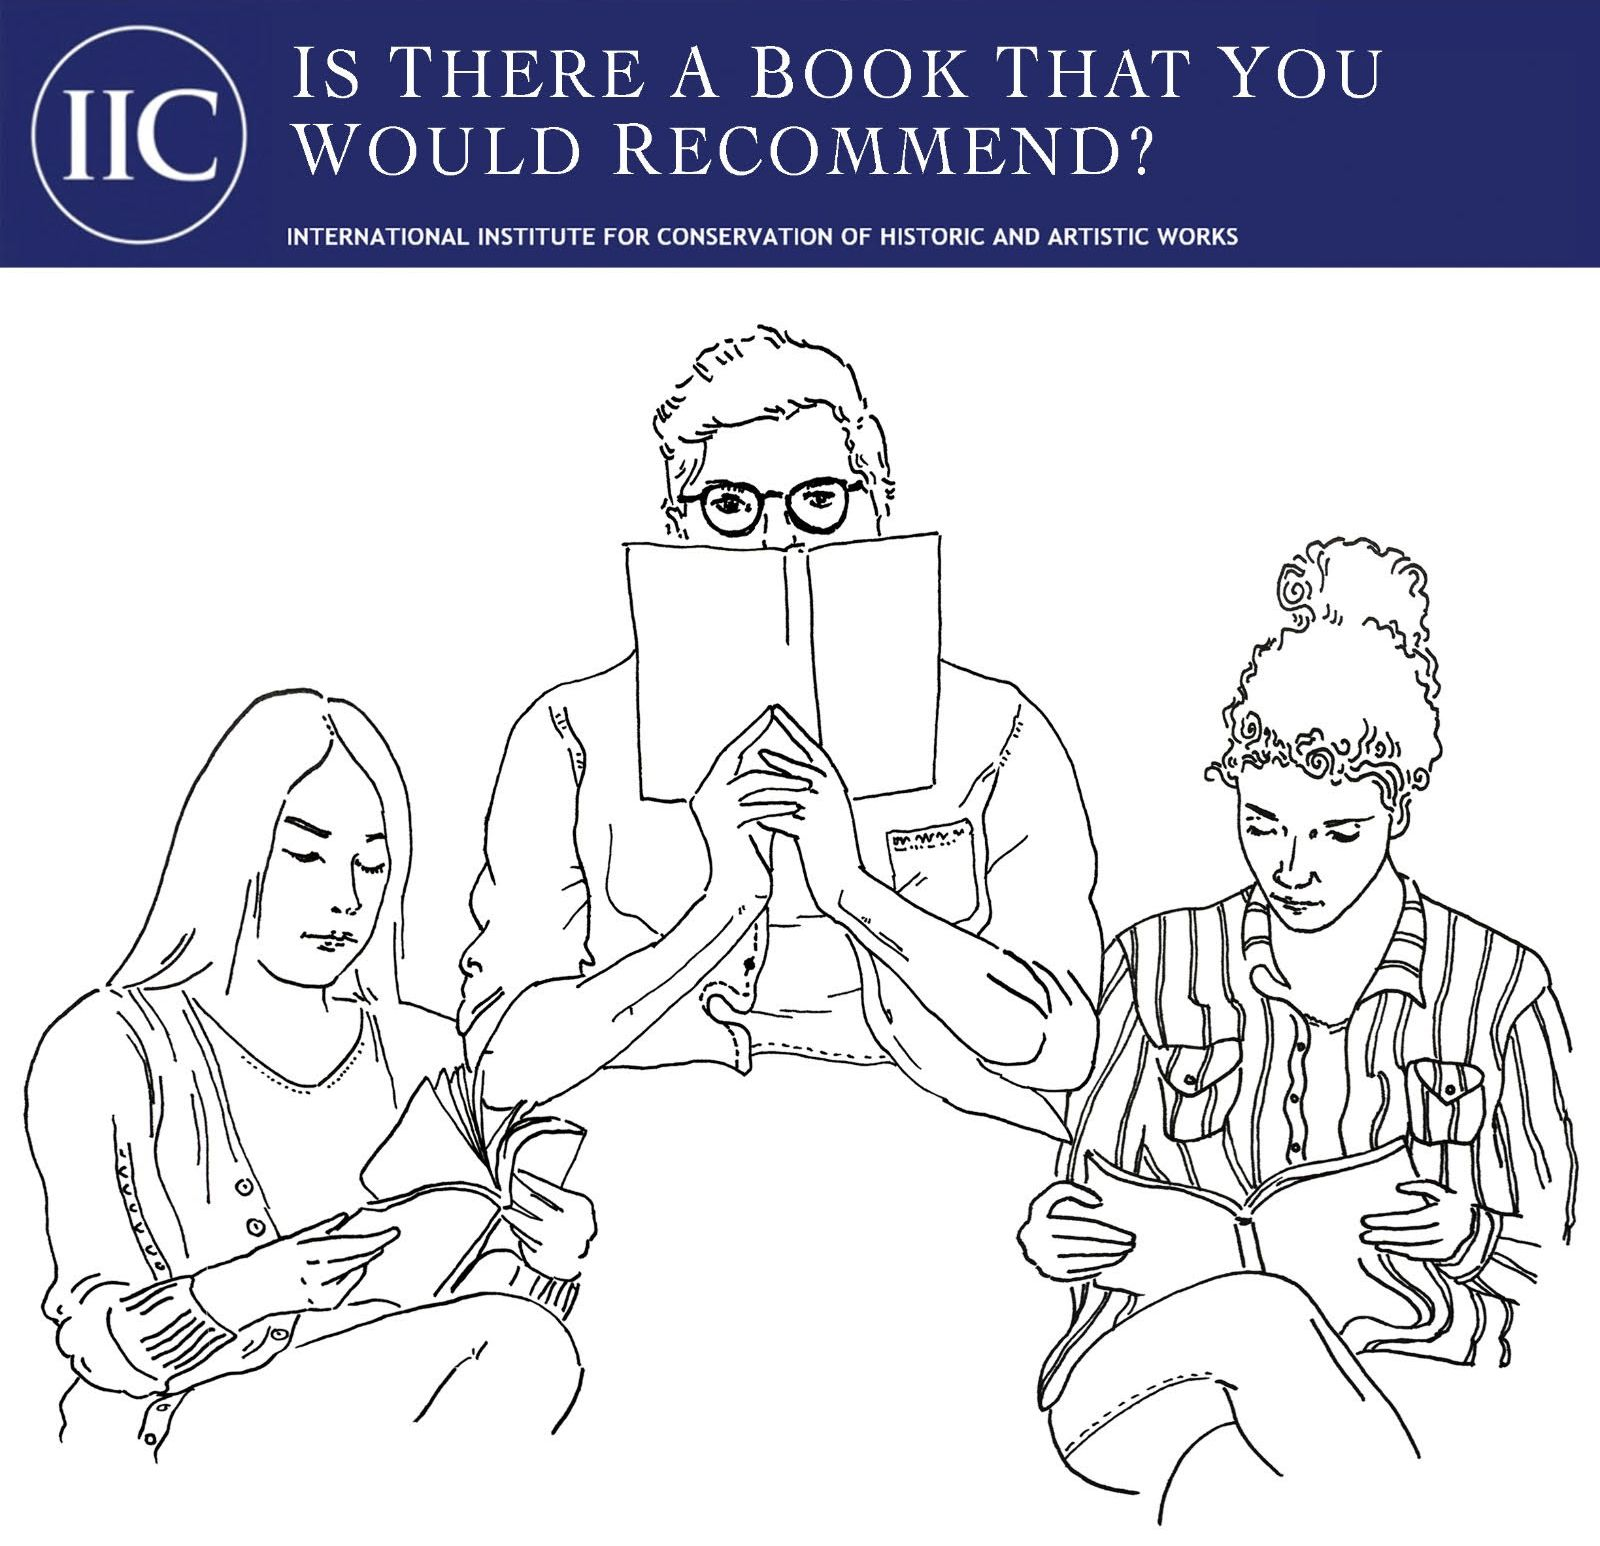 Three students reading. Drawings by Alexandra Taylor, NiC Book Reviews Coordinator